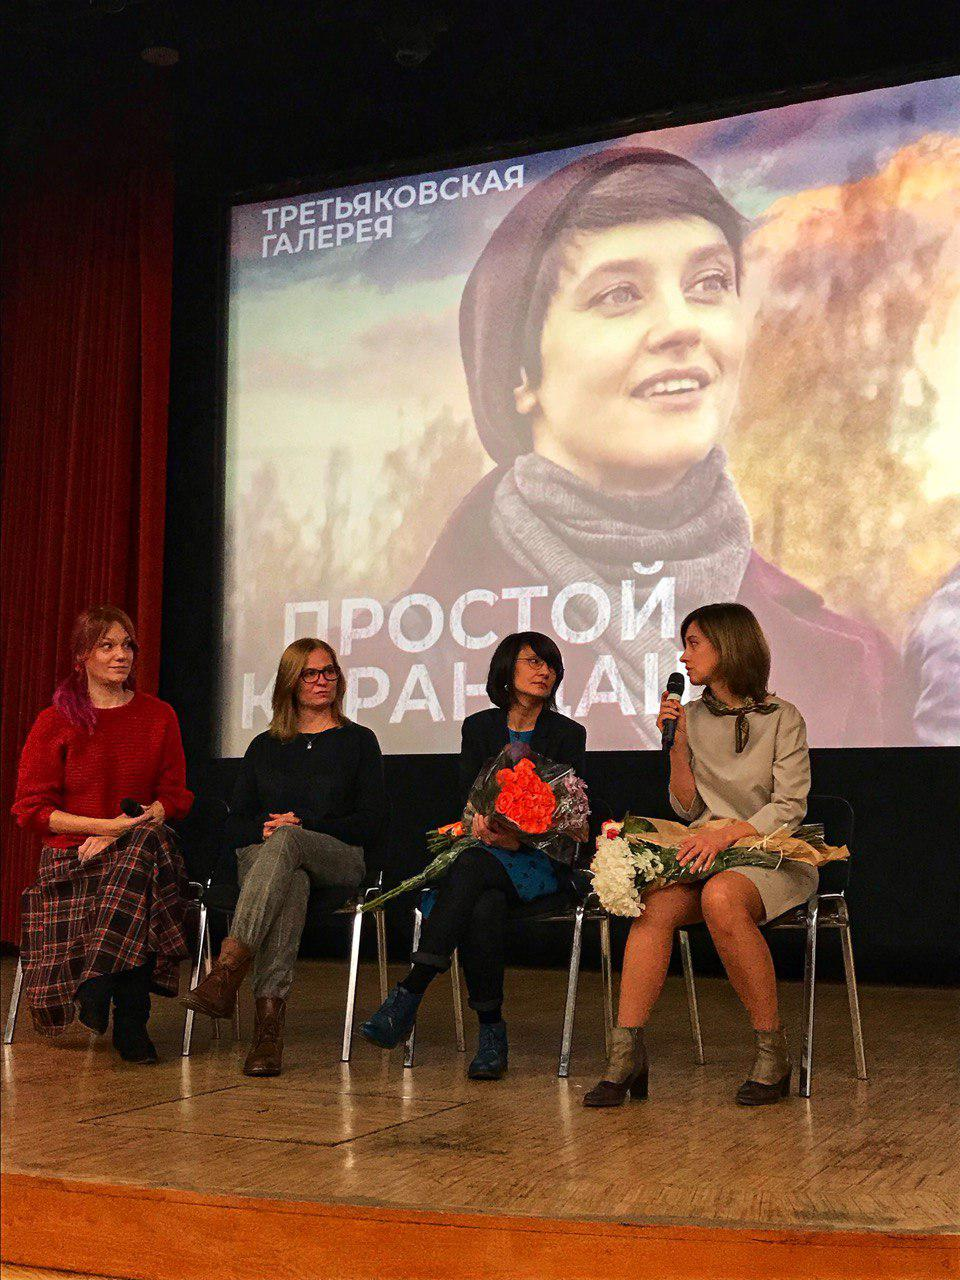 Справа налево: актриса Надежда Горелова, сценарист и режиссер Наталья Назарова, актриса Олеся Иванцова, модератор показа